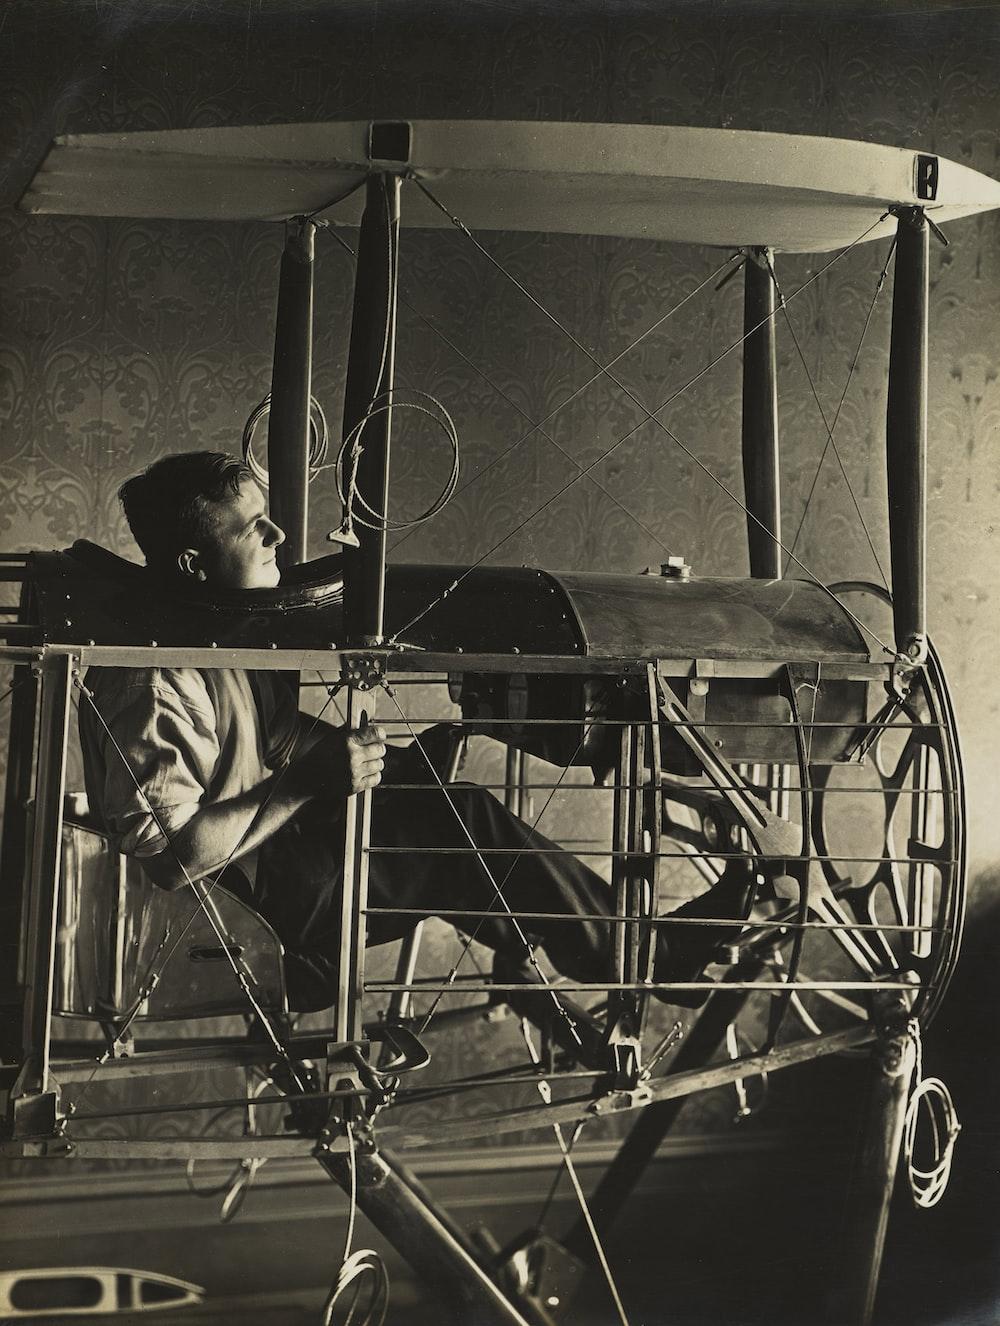 man in plane frame